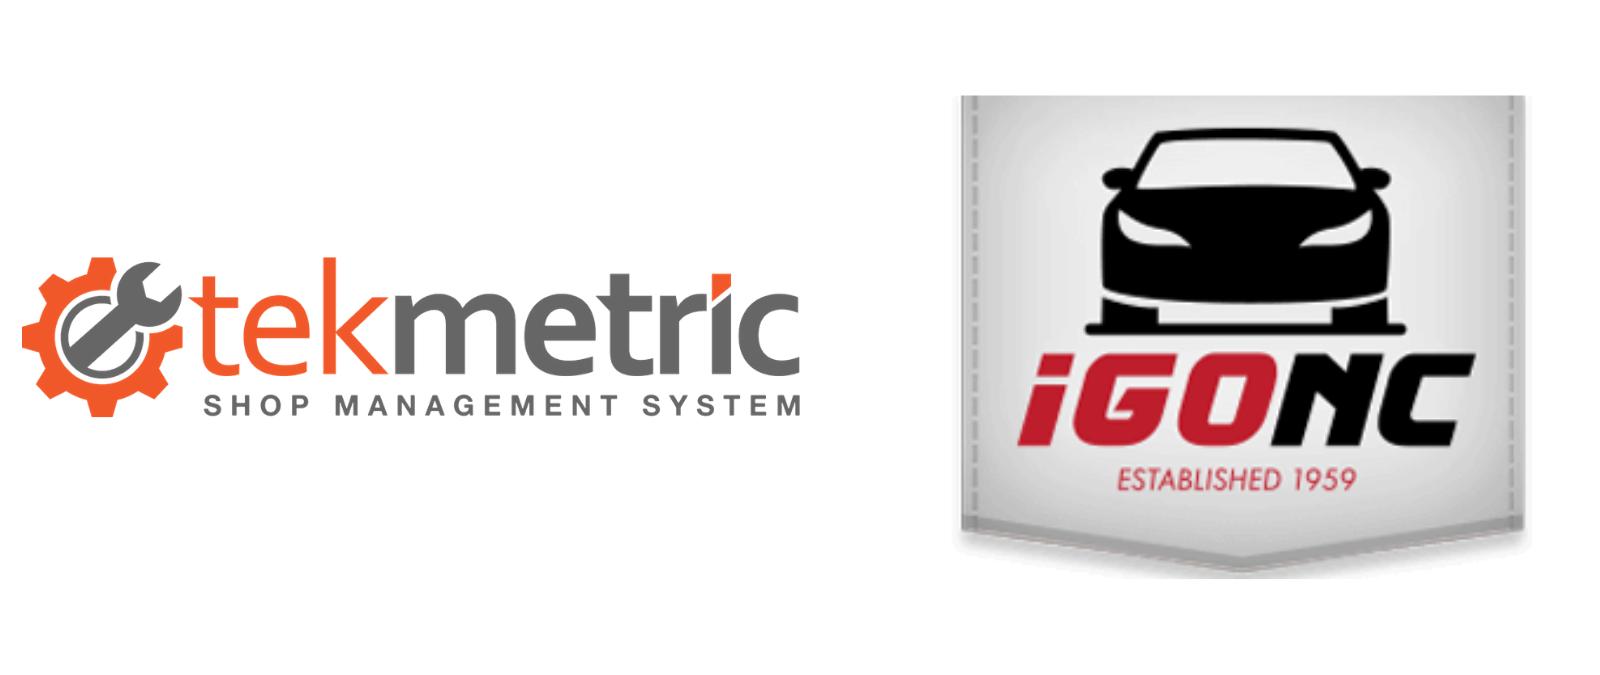 igonc - tekmetric